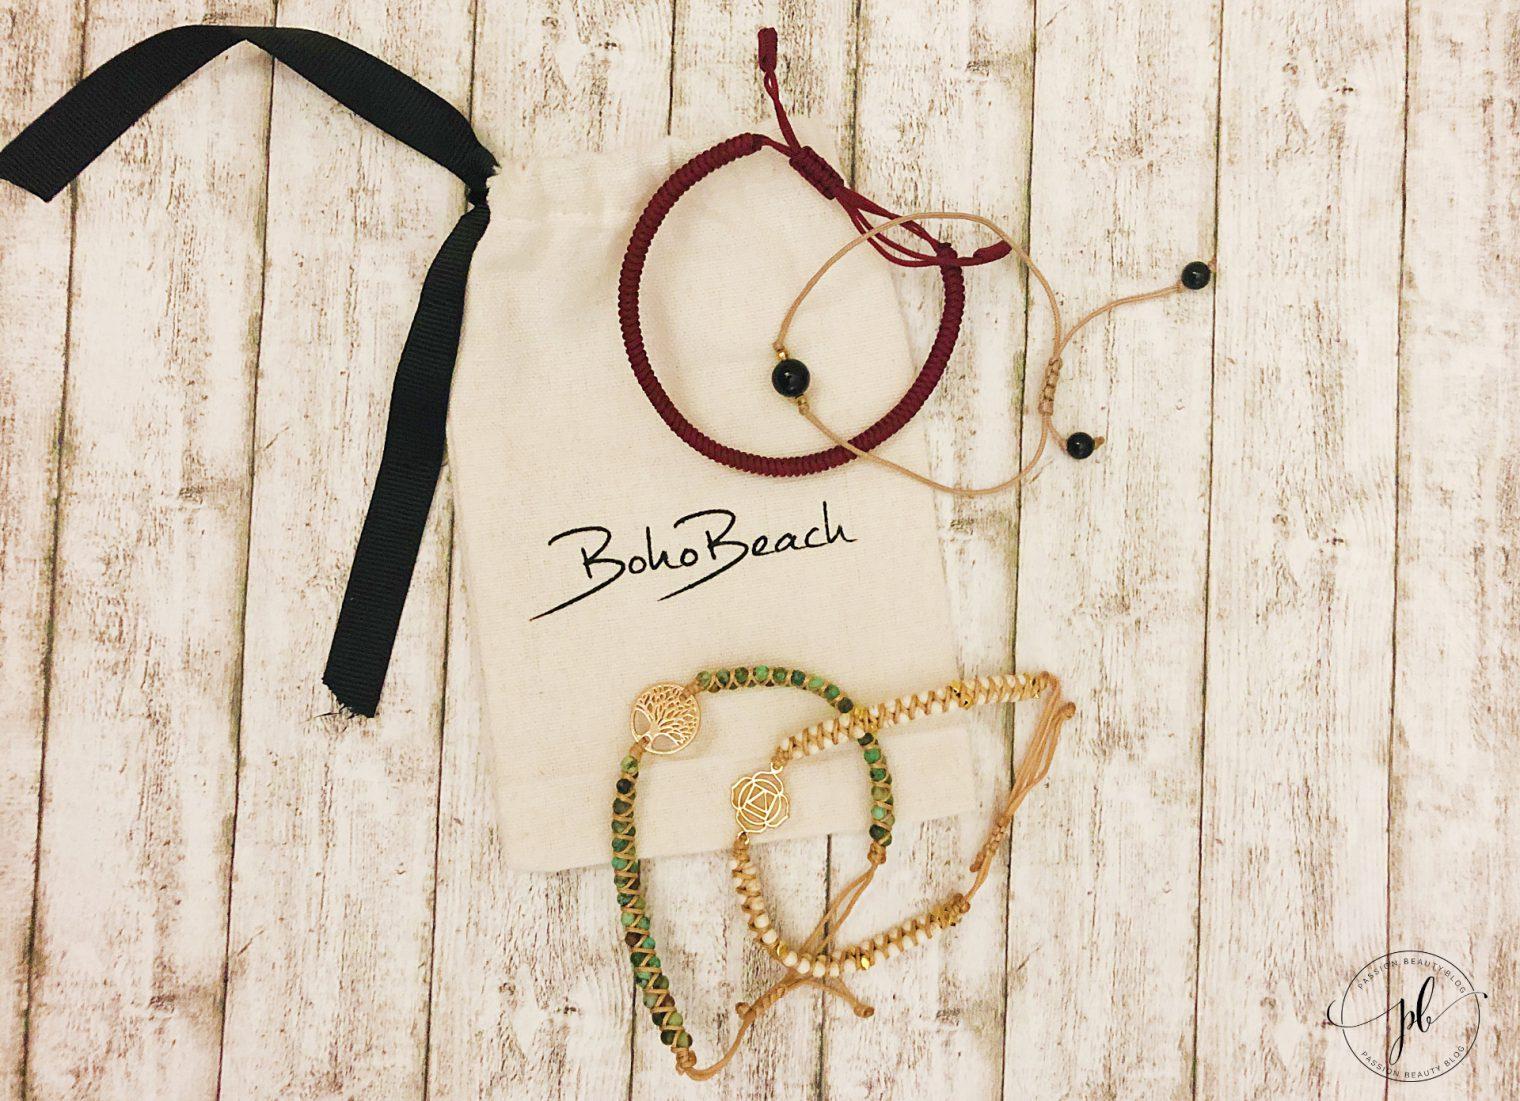 Boho Beach Armbänder